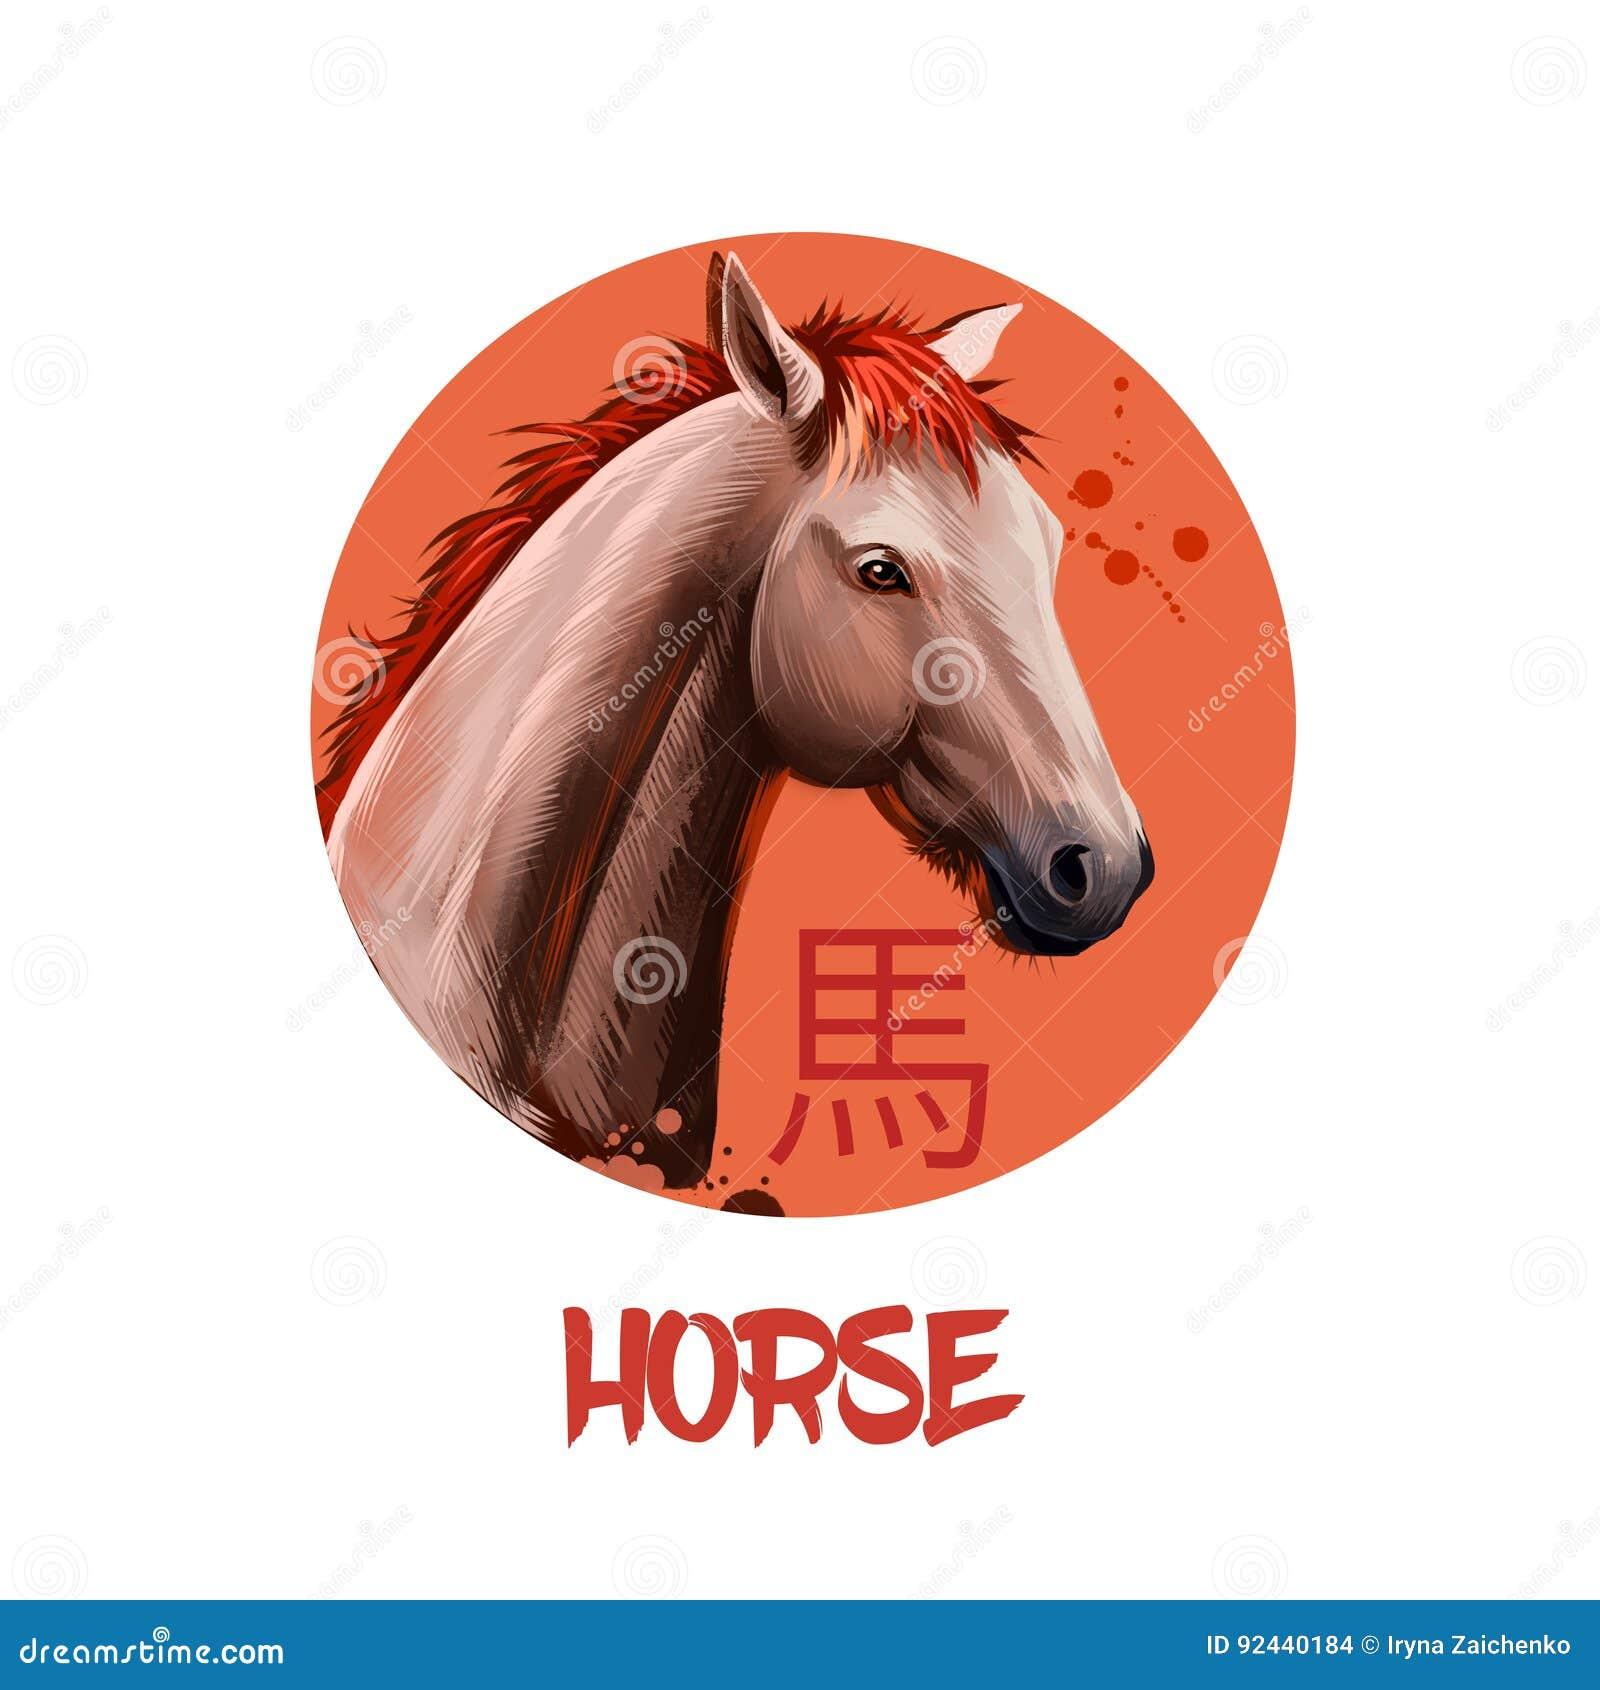 Horse Chinese Horoscope Character Isolated On White Symbol Of New